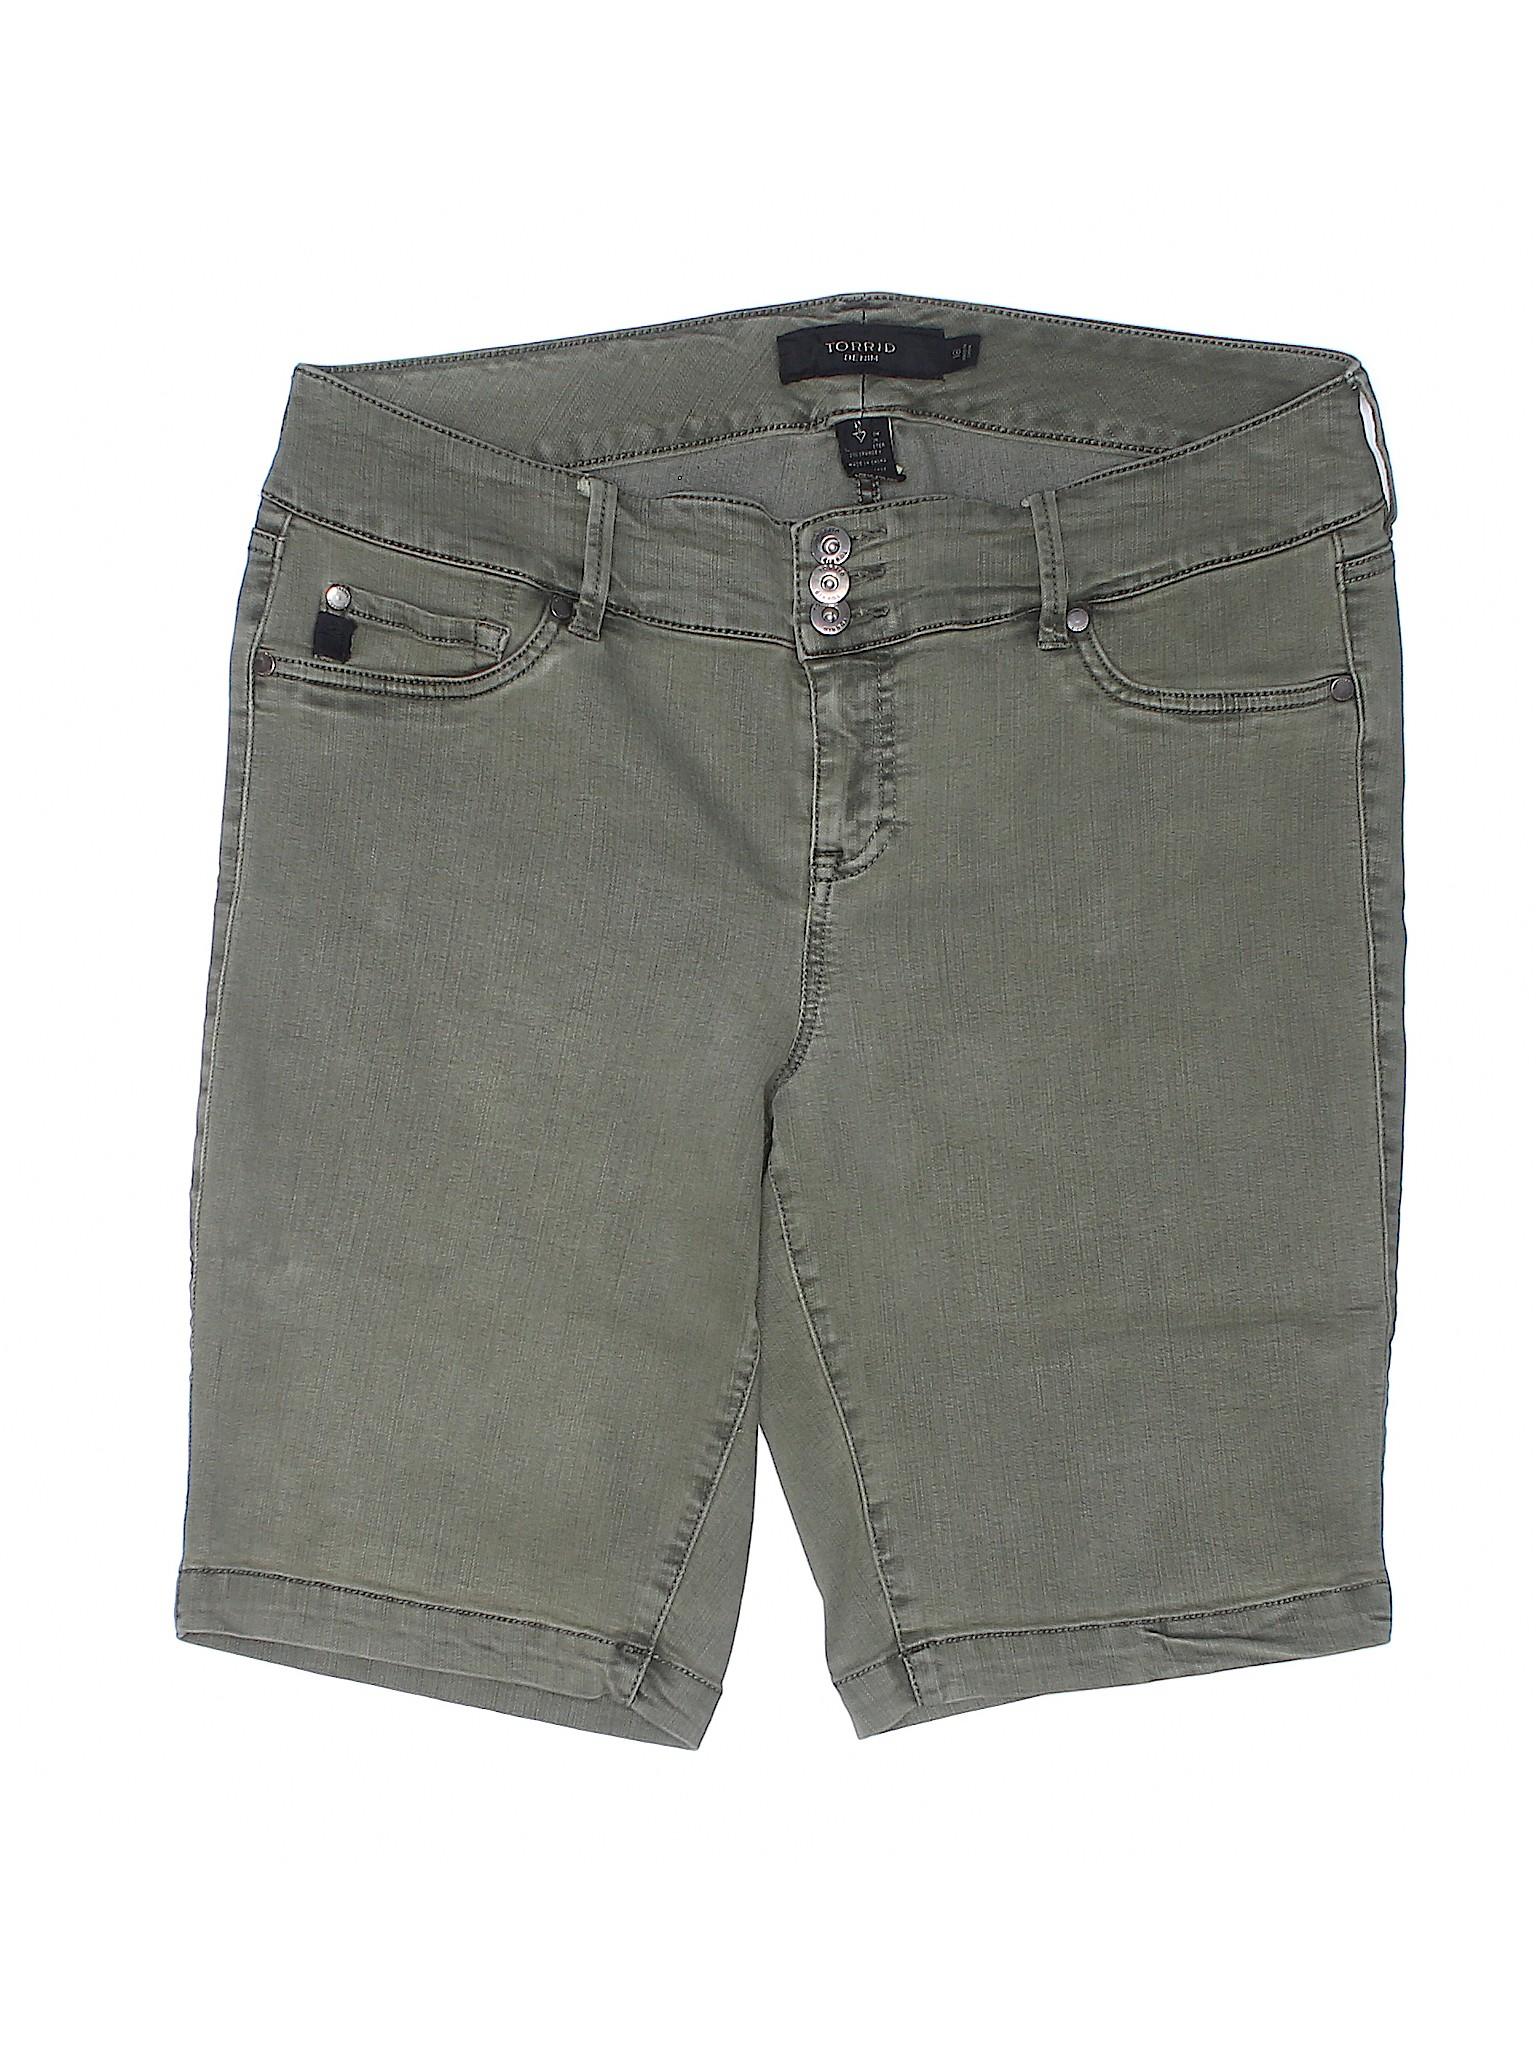 Boutique winter Denim Shorts winter Torrid Denim Shorts Boutique winter Boutique Torrid TZqqwR15x